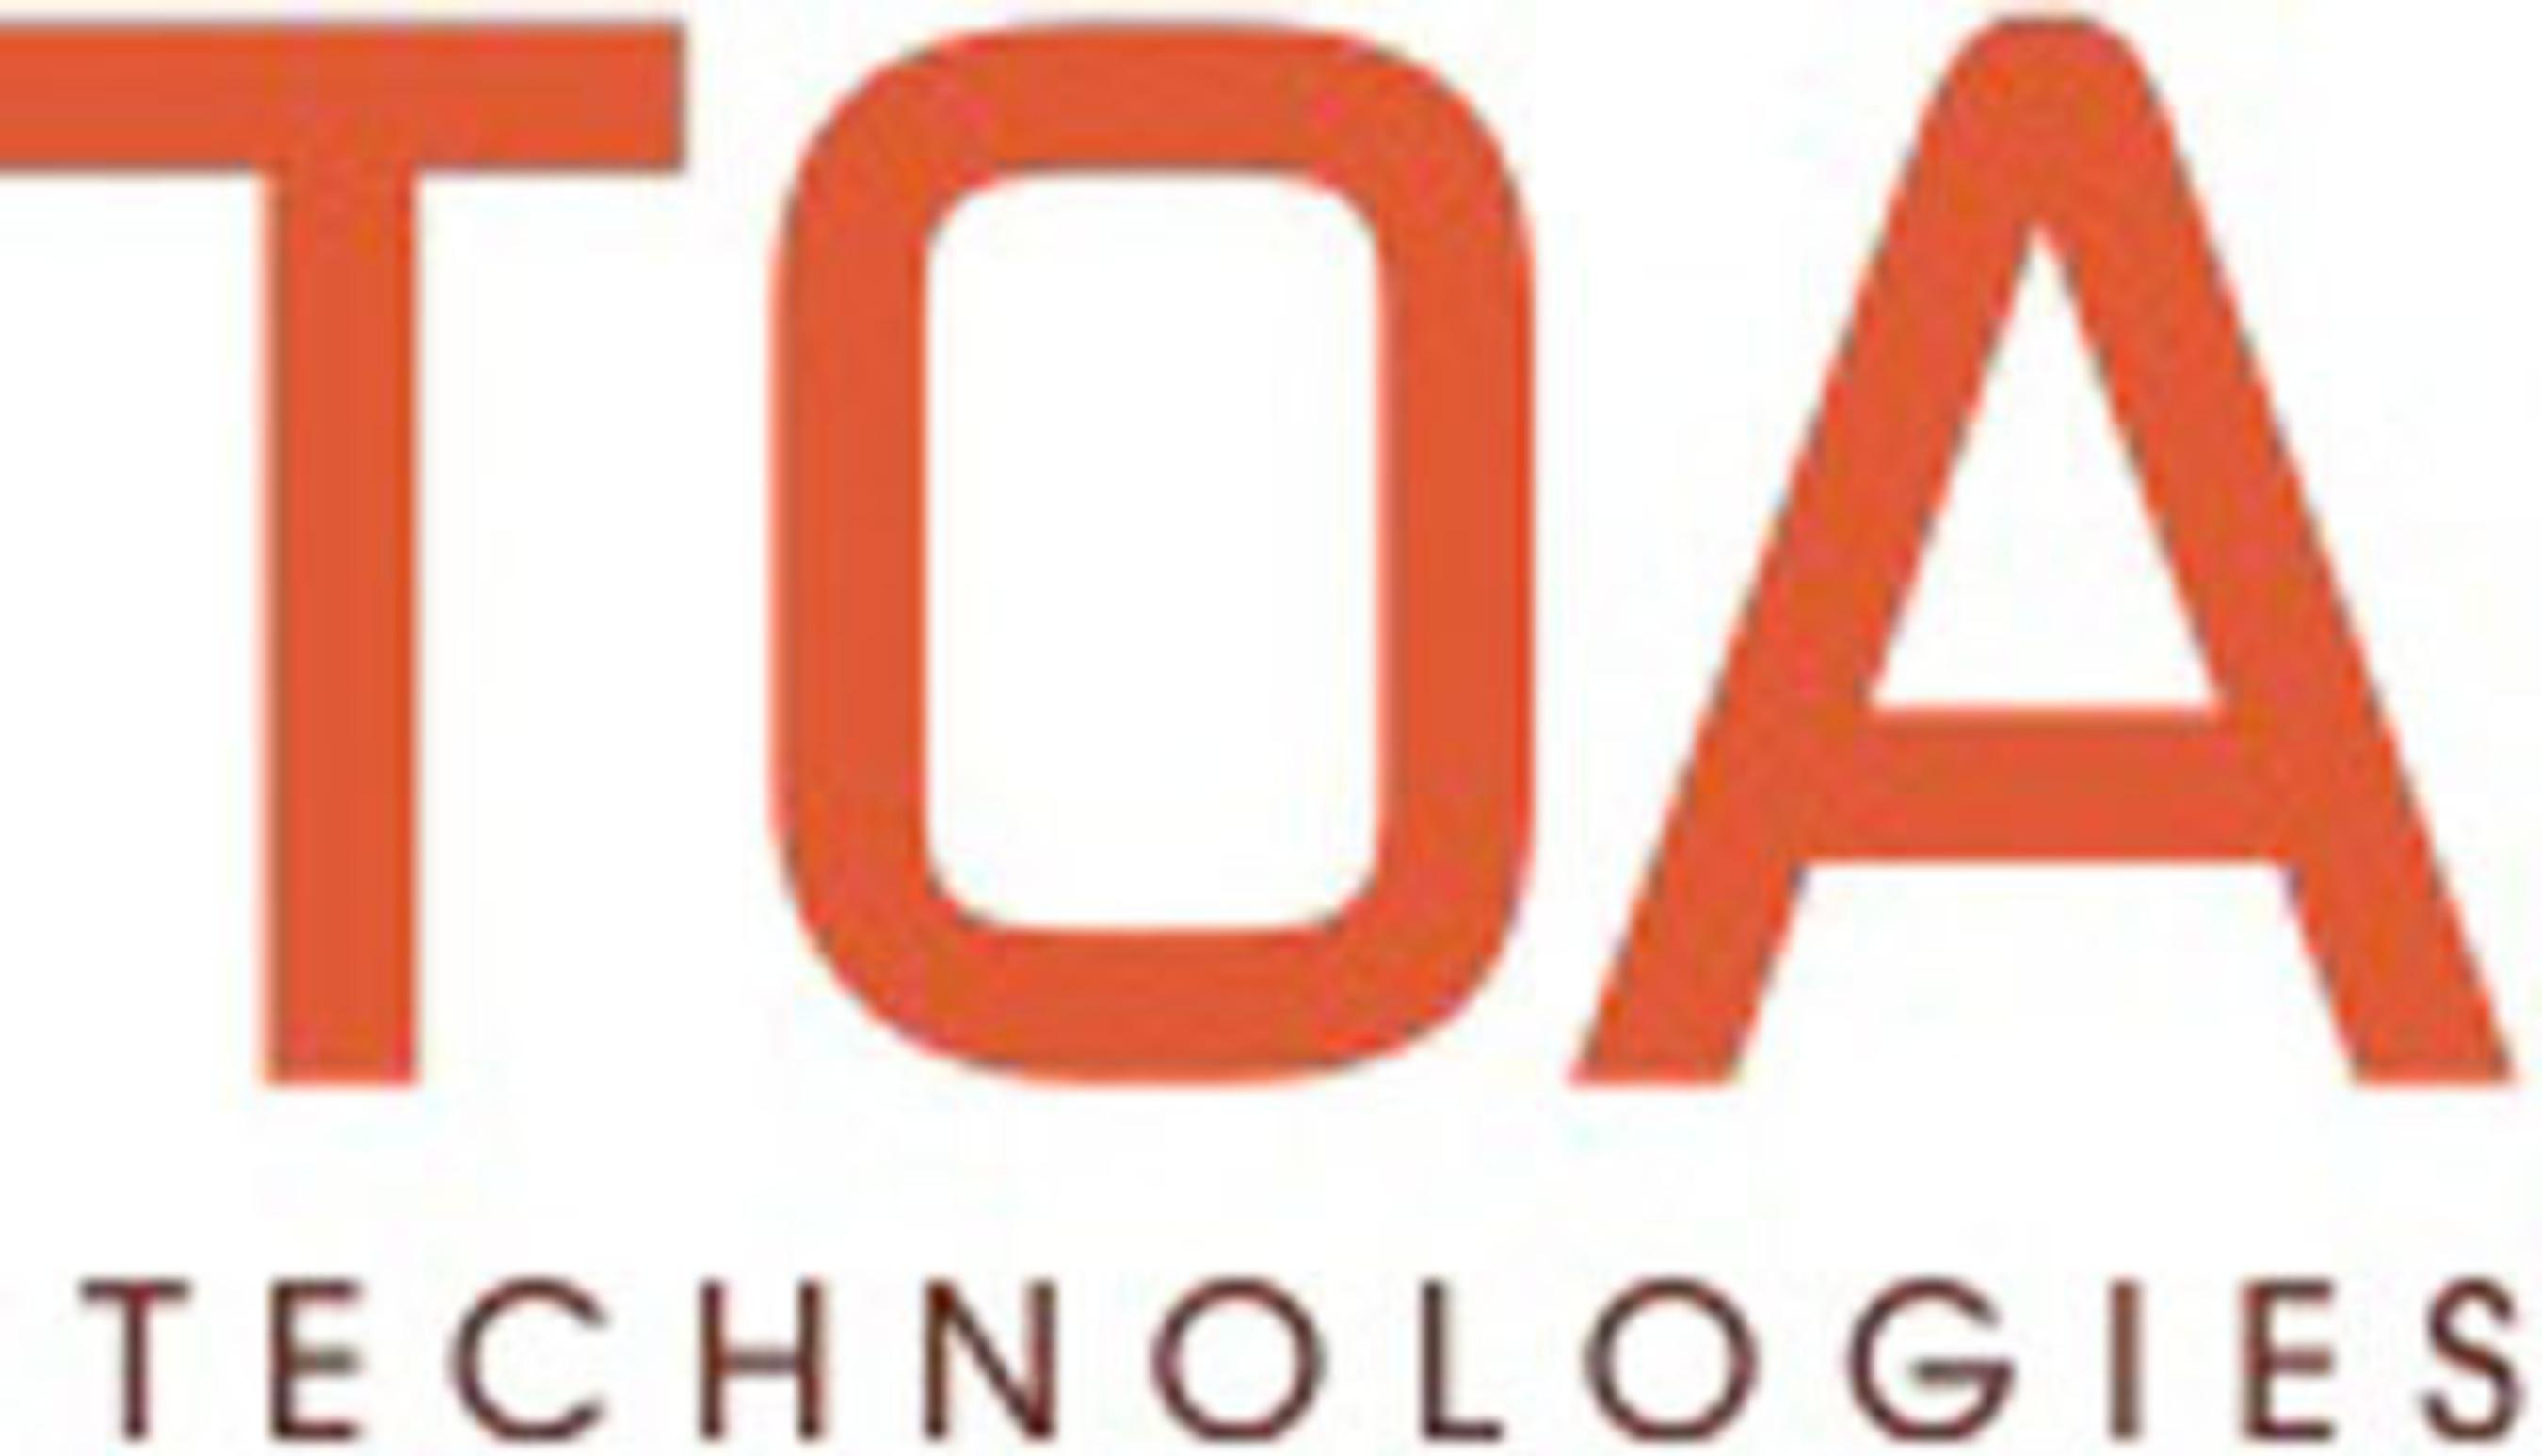 TOA Technologies Logo. (PRNewsFoto/TOA Technologies) (PRNewsFoto/)